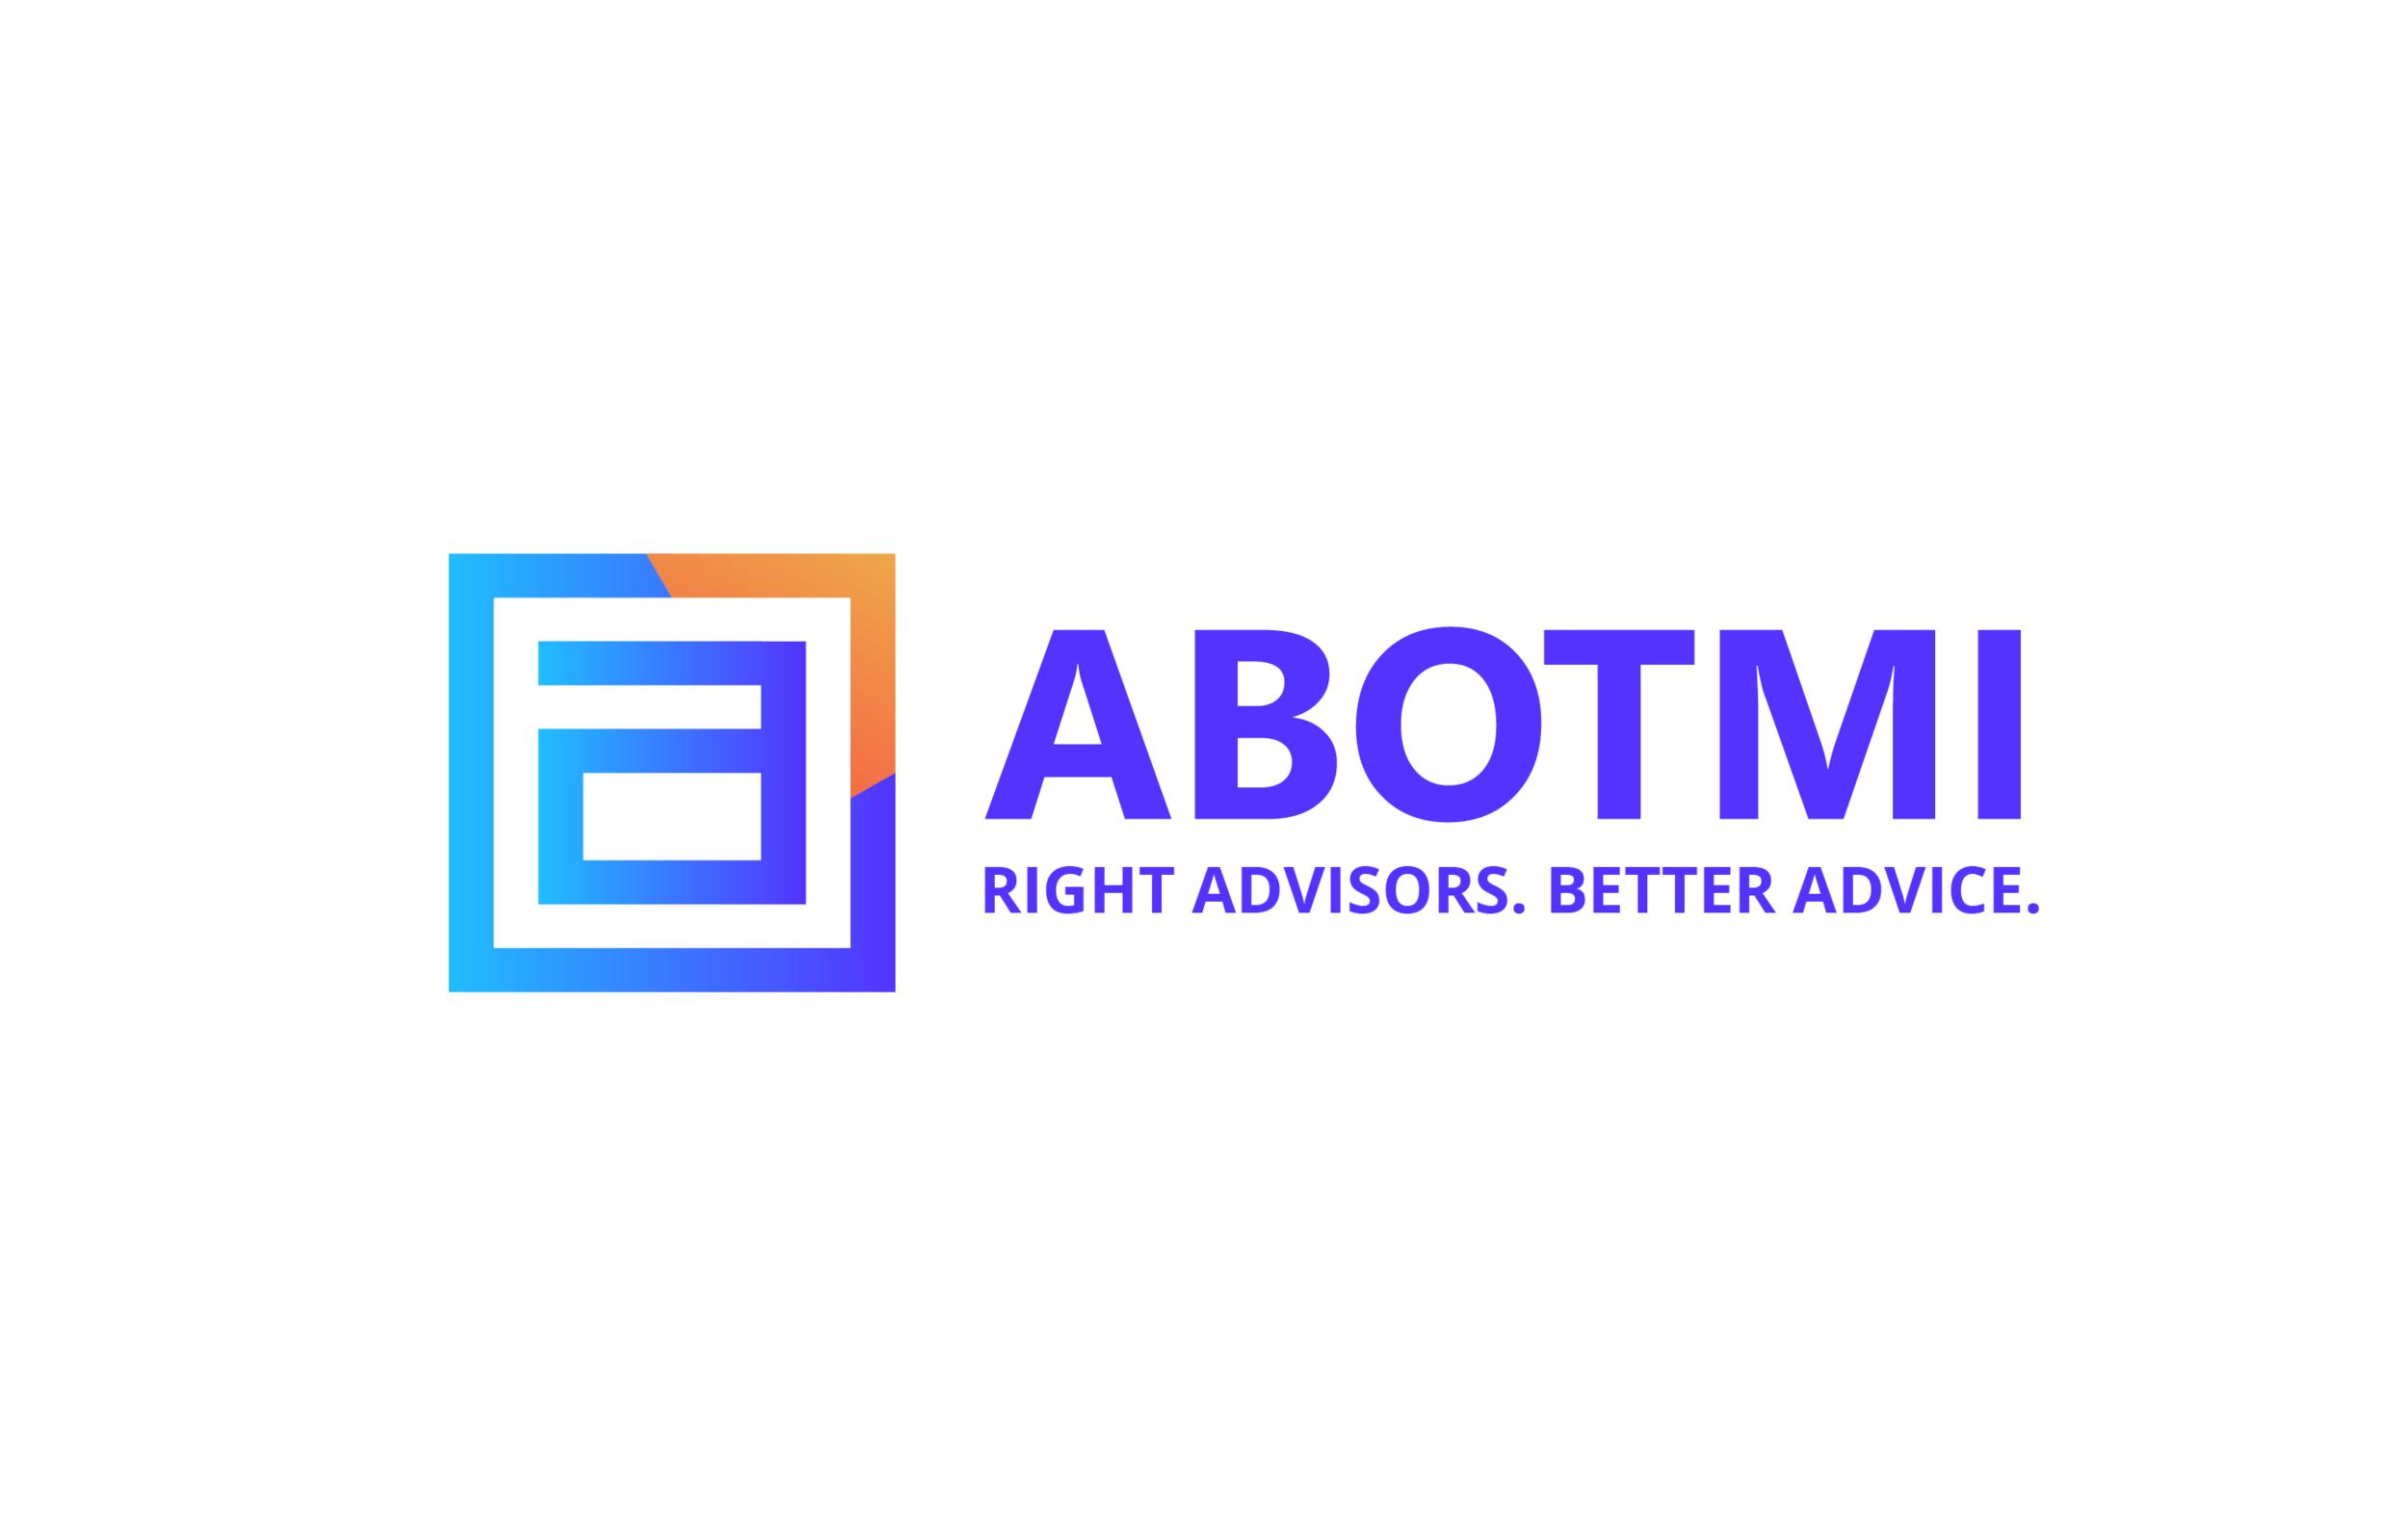 abotmi-logo.png